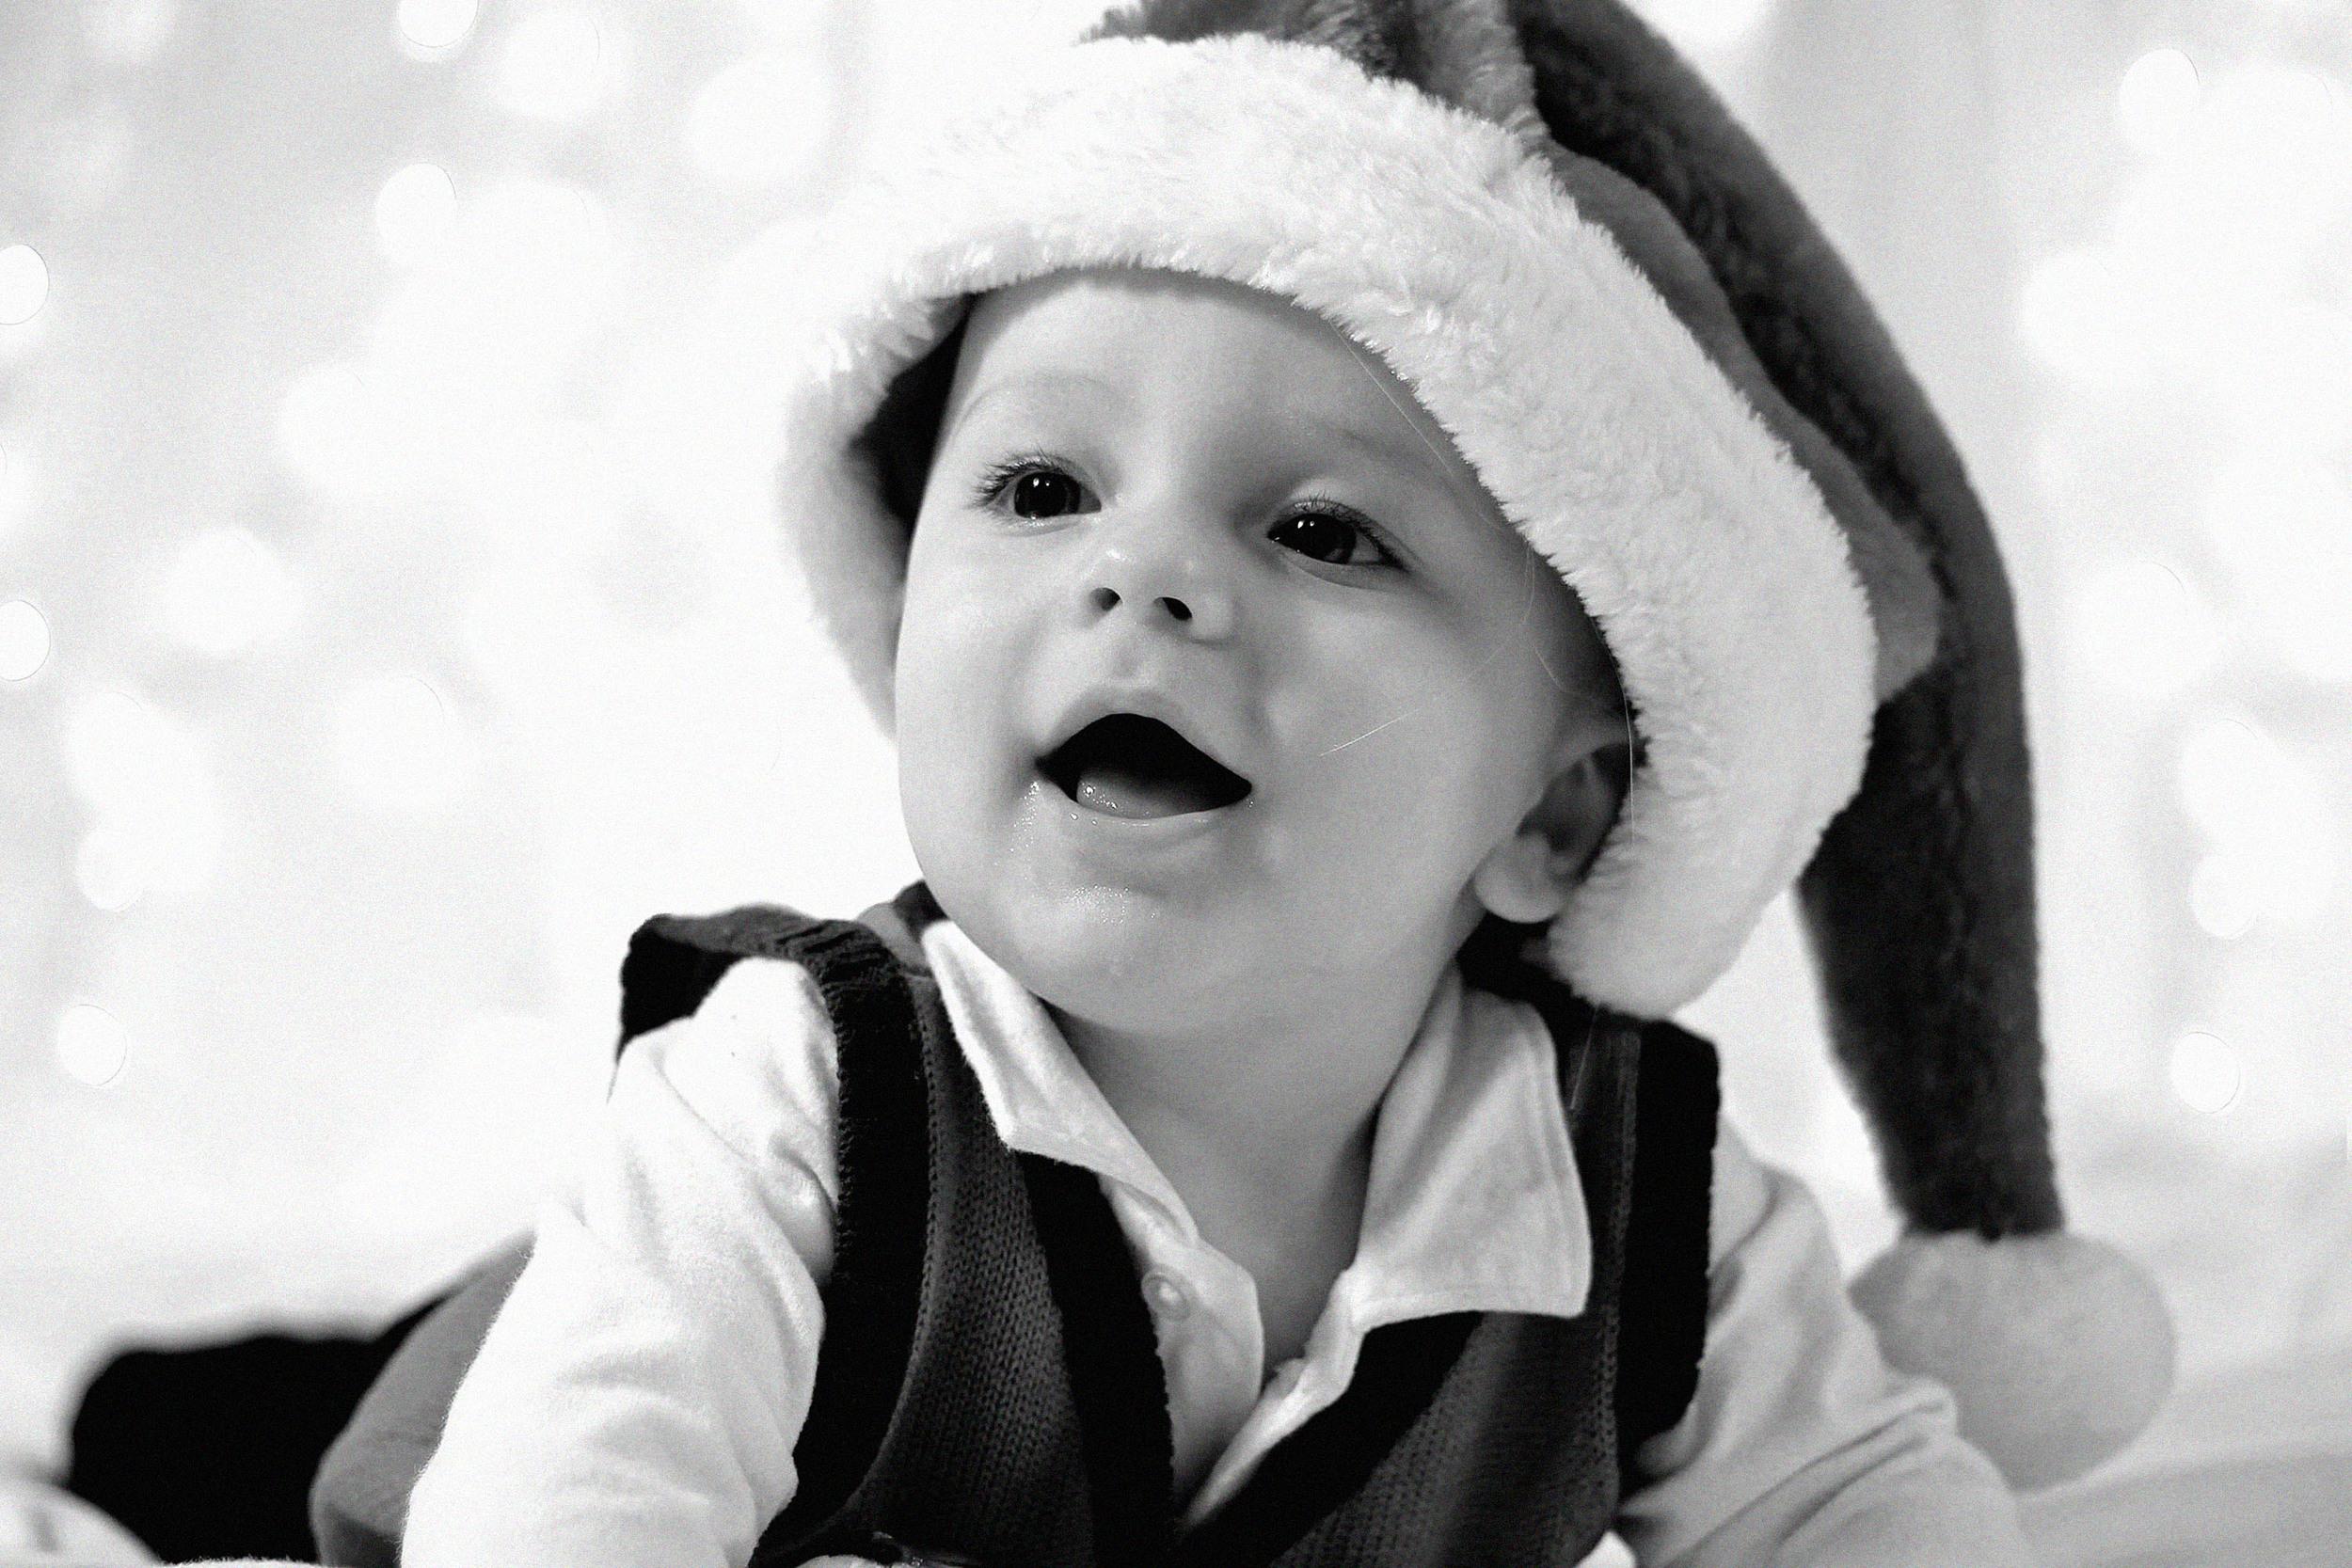 christmas baby bw.jpg